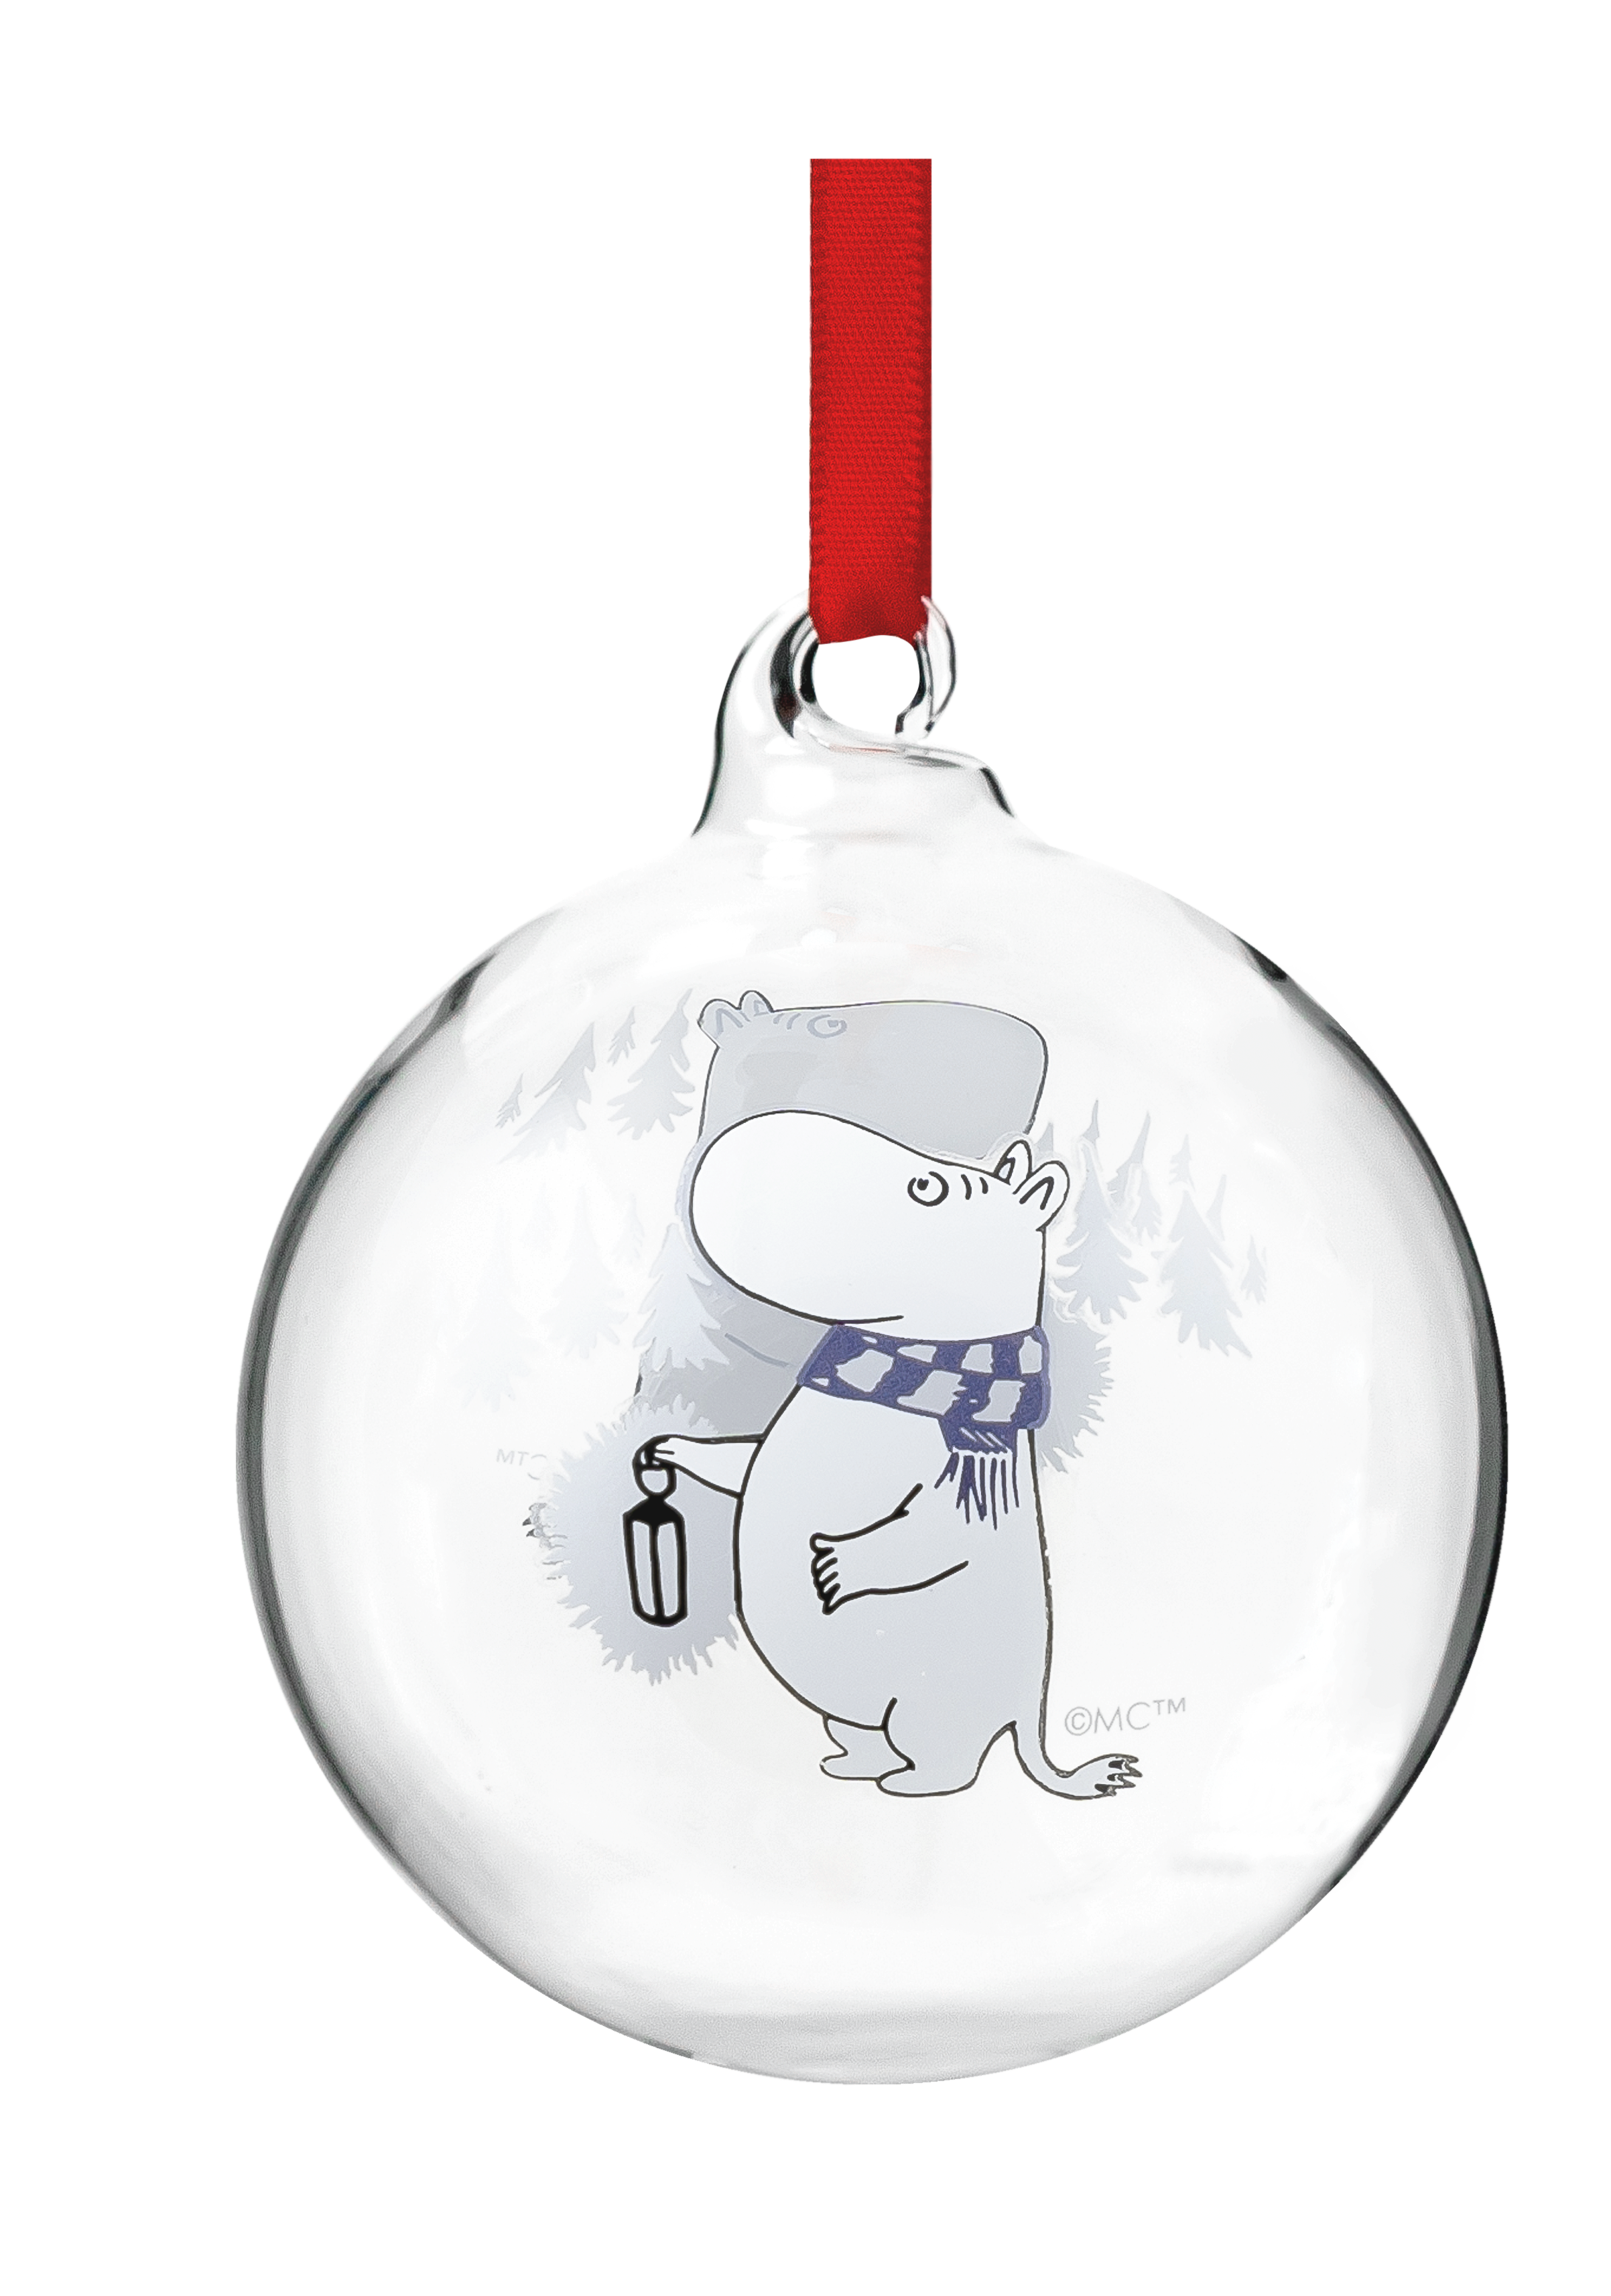 Moomin by Muurla Moomin decoration ball 7 cm